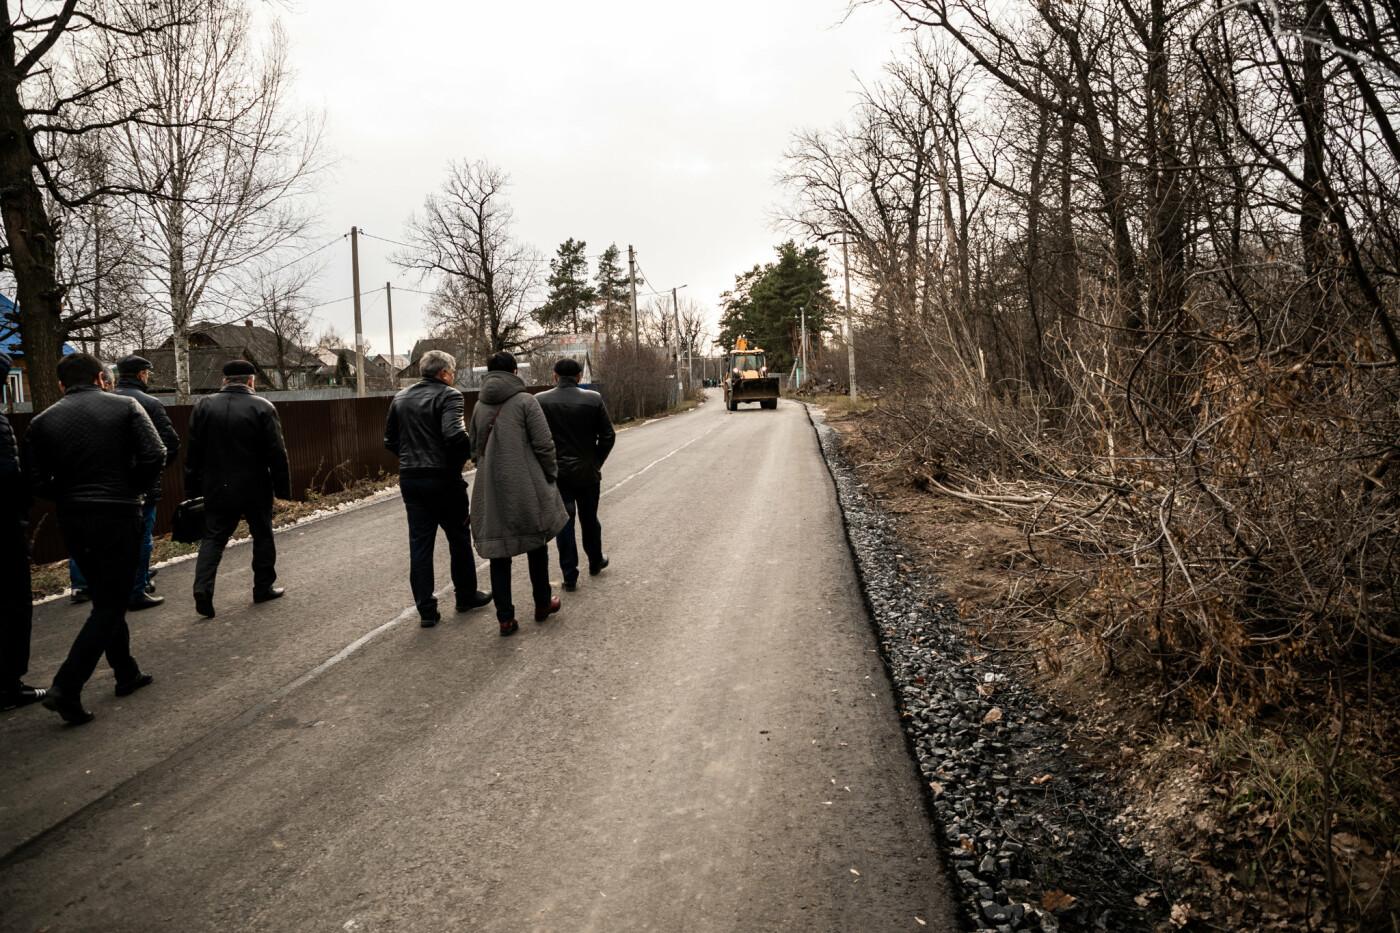 В пригороде Тамбова построили новую дорогу за 3,4 млн рублей, фото-3